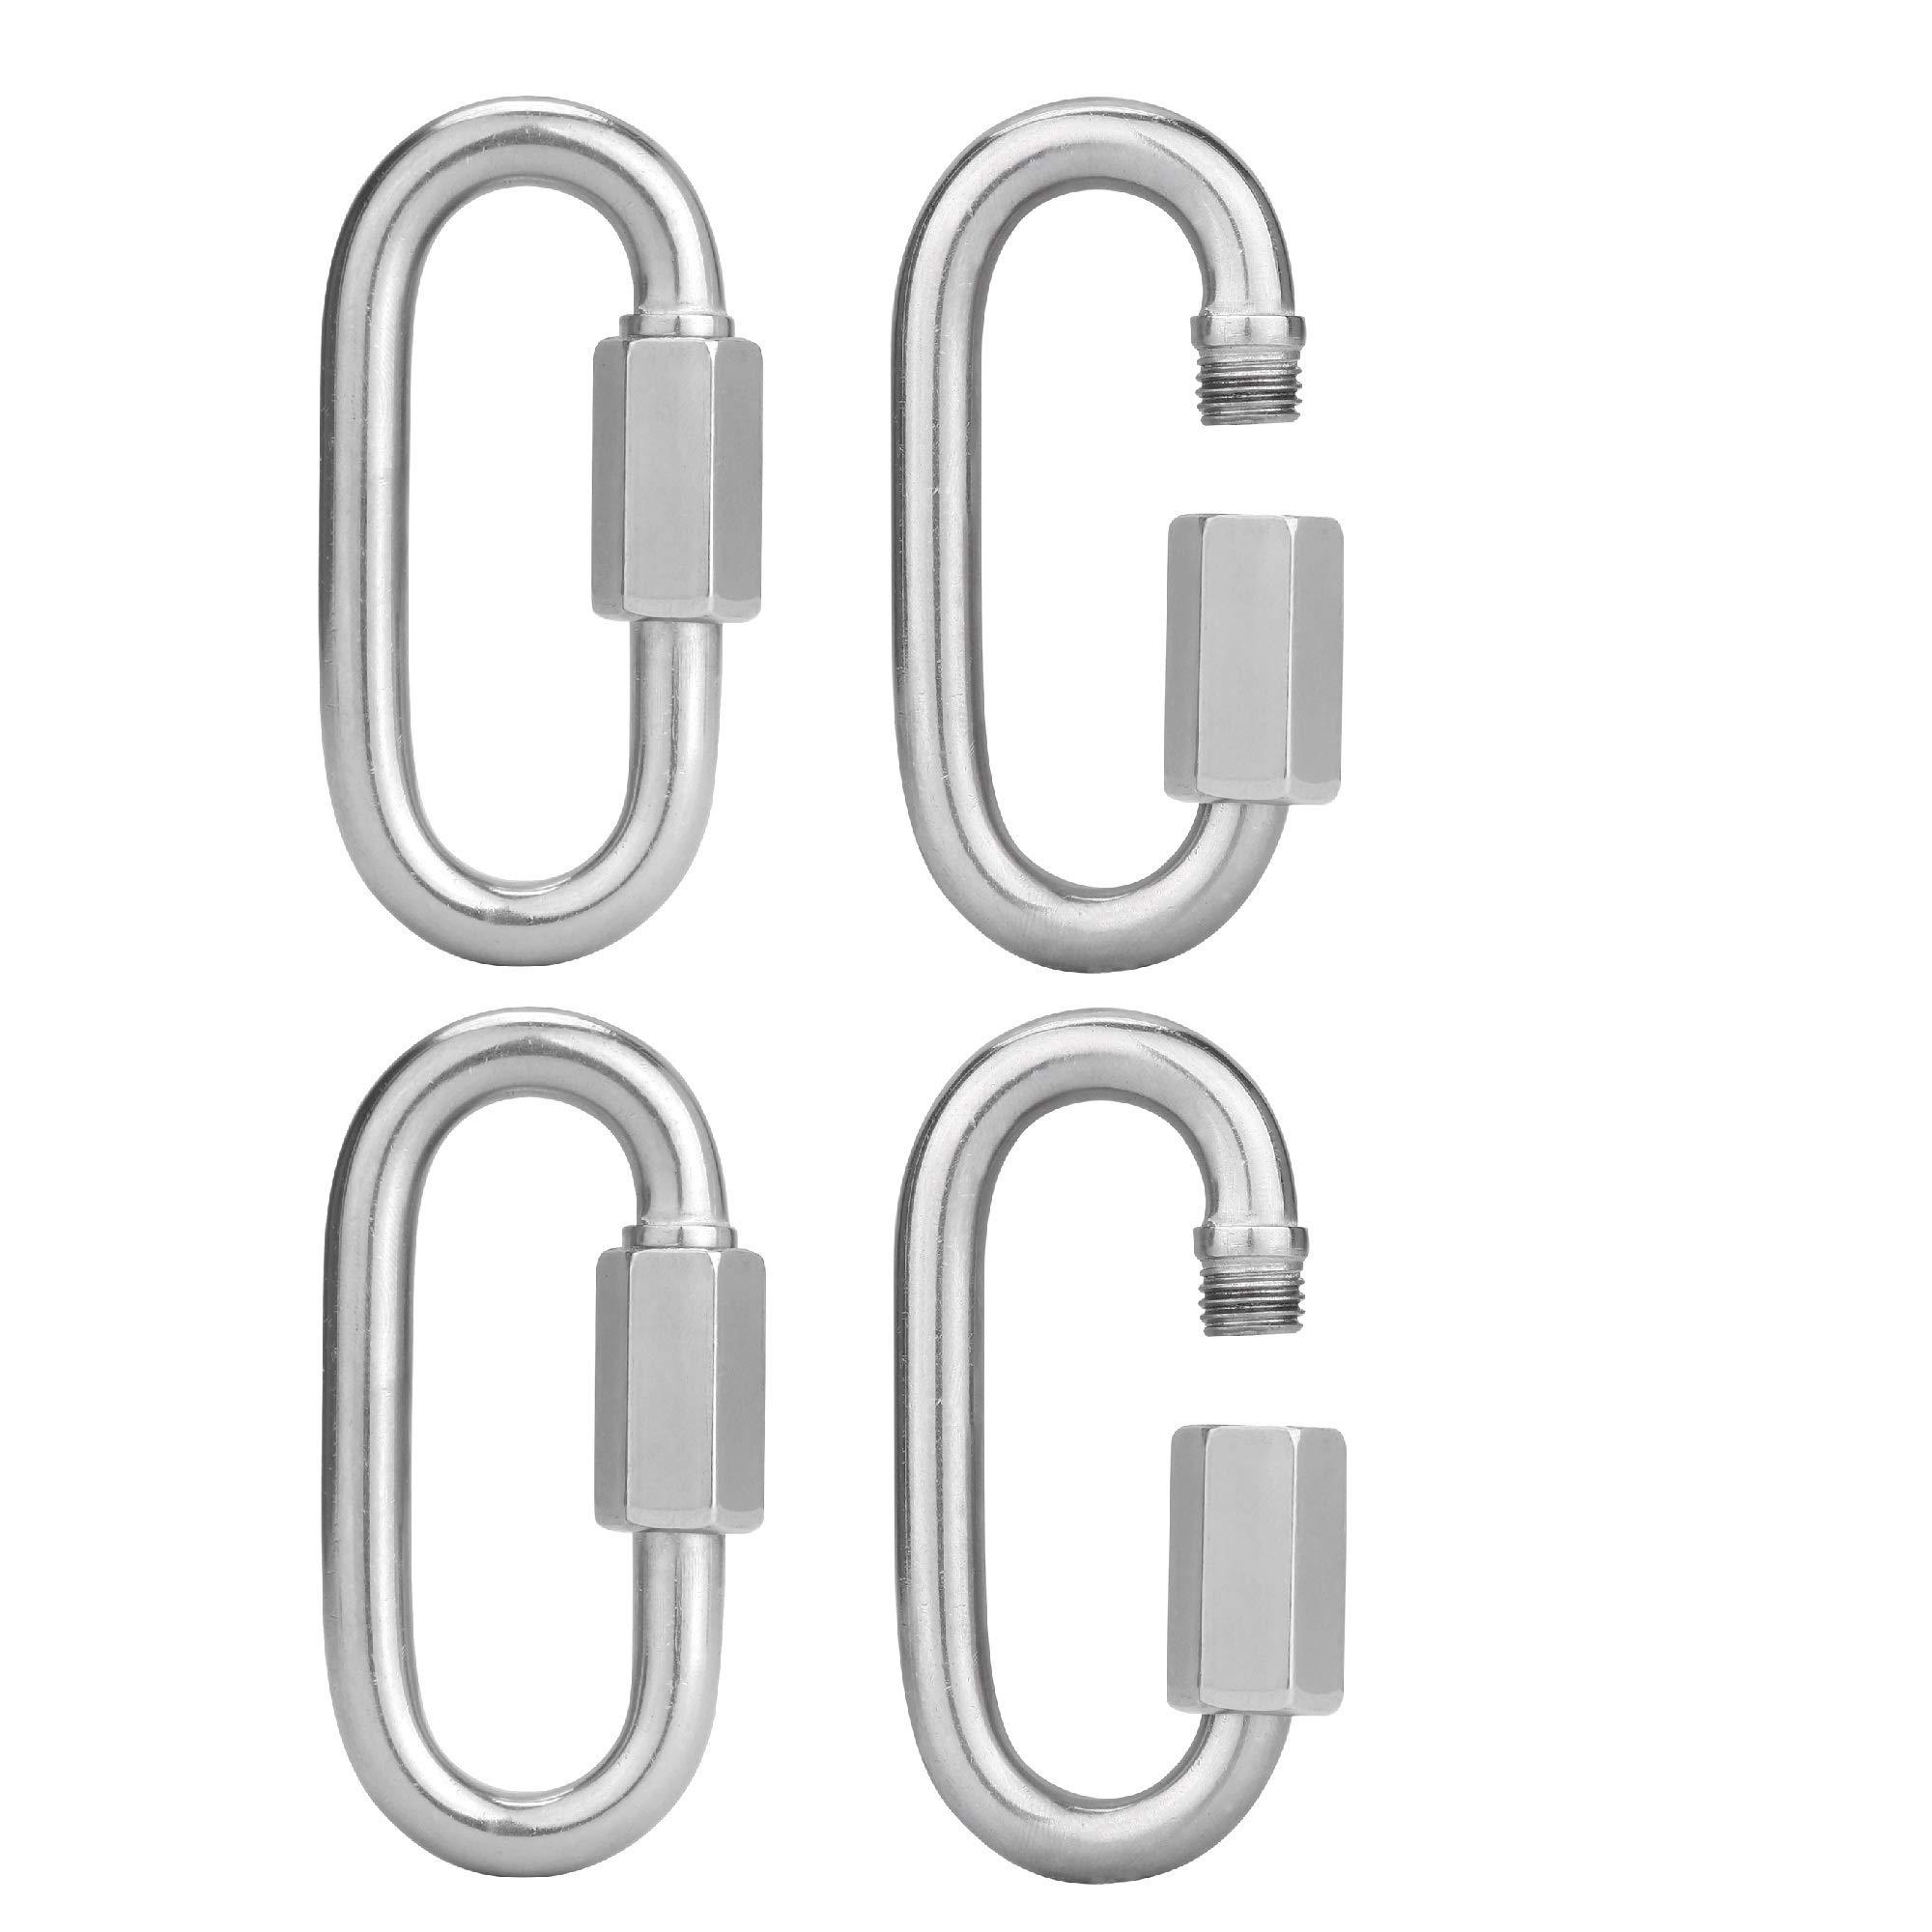 Anndason 4 Pcs M8/0.32'' 304 Stainless Steel D Shape Quick Link C1arabiner Lock Ring 691KG 1523LB